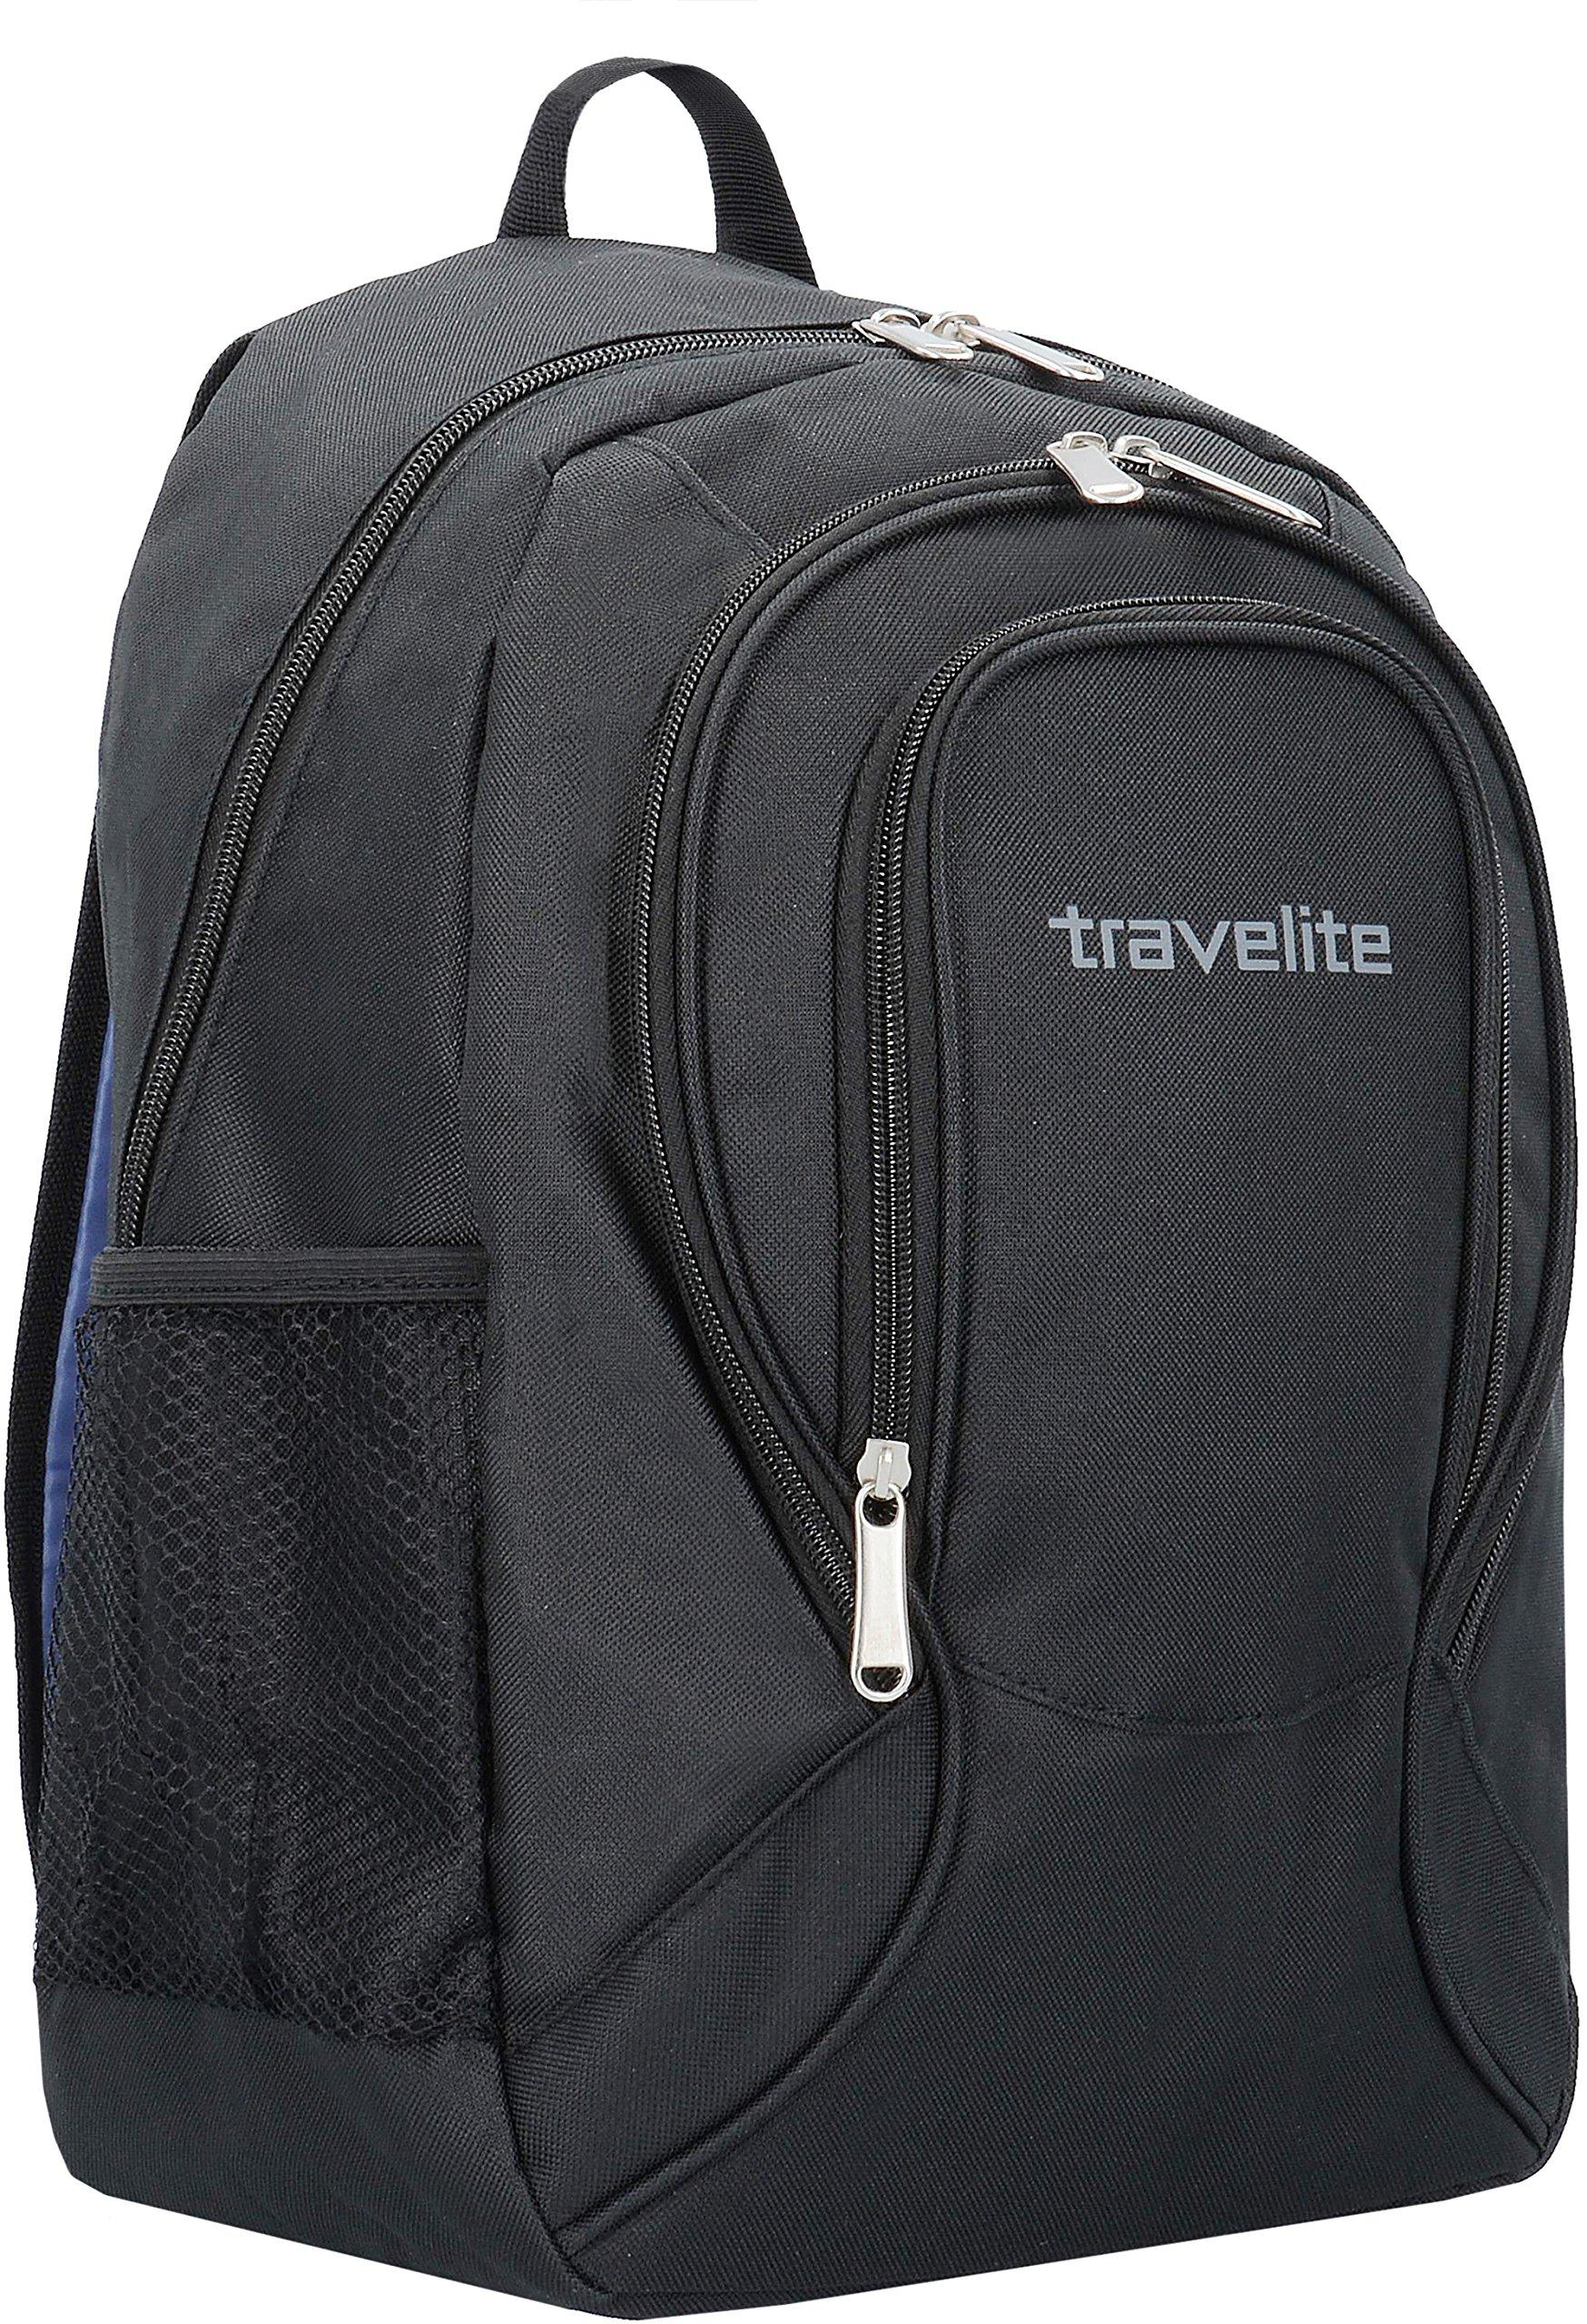 Travelite-Garda-XL-Reiseset-3tlg-Reisetasche-Rucksack-Kulturbeutel